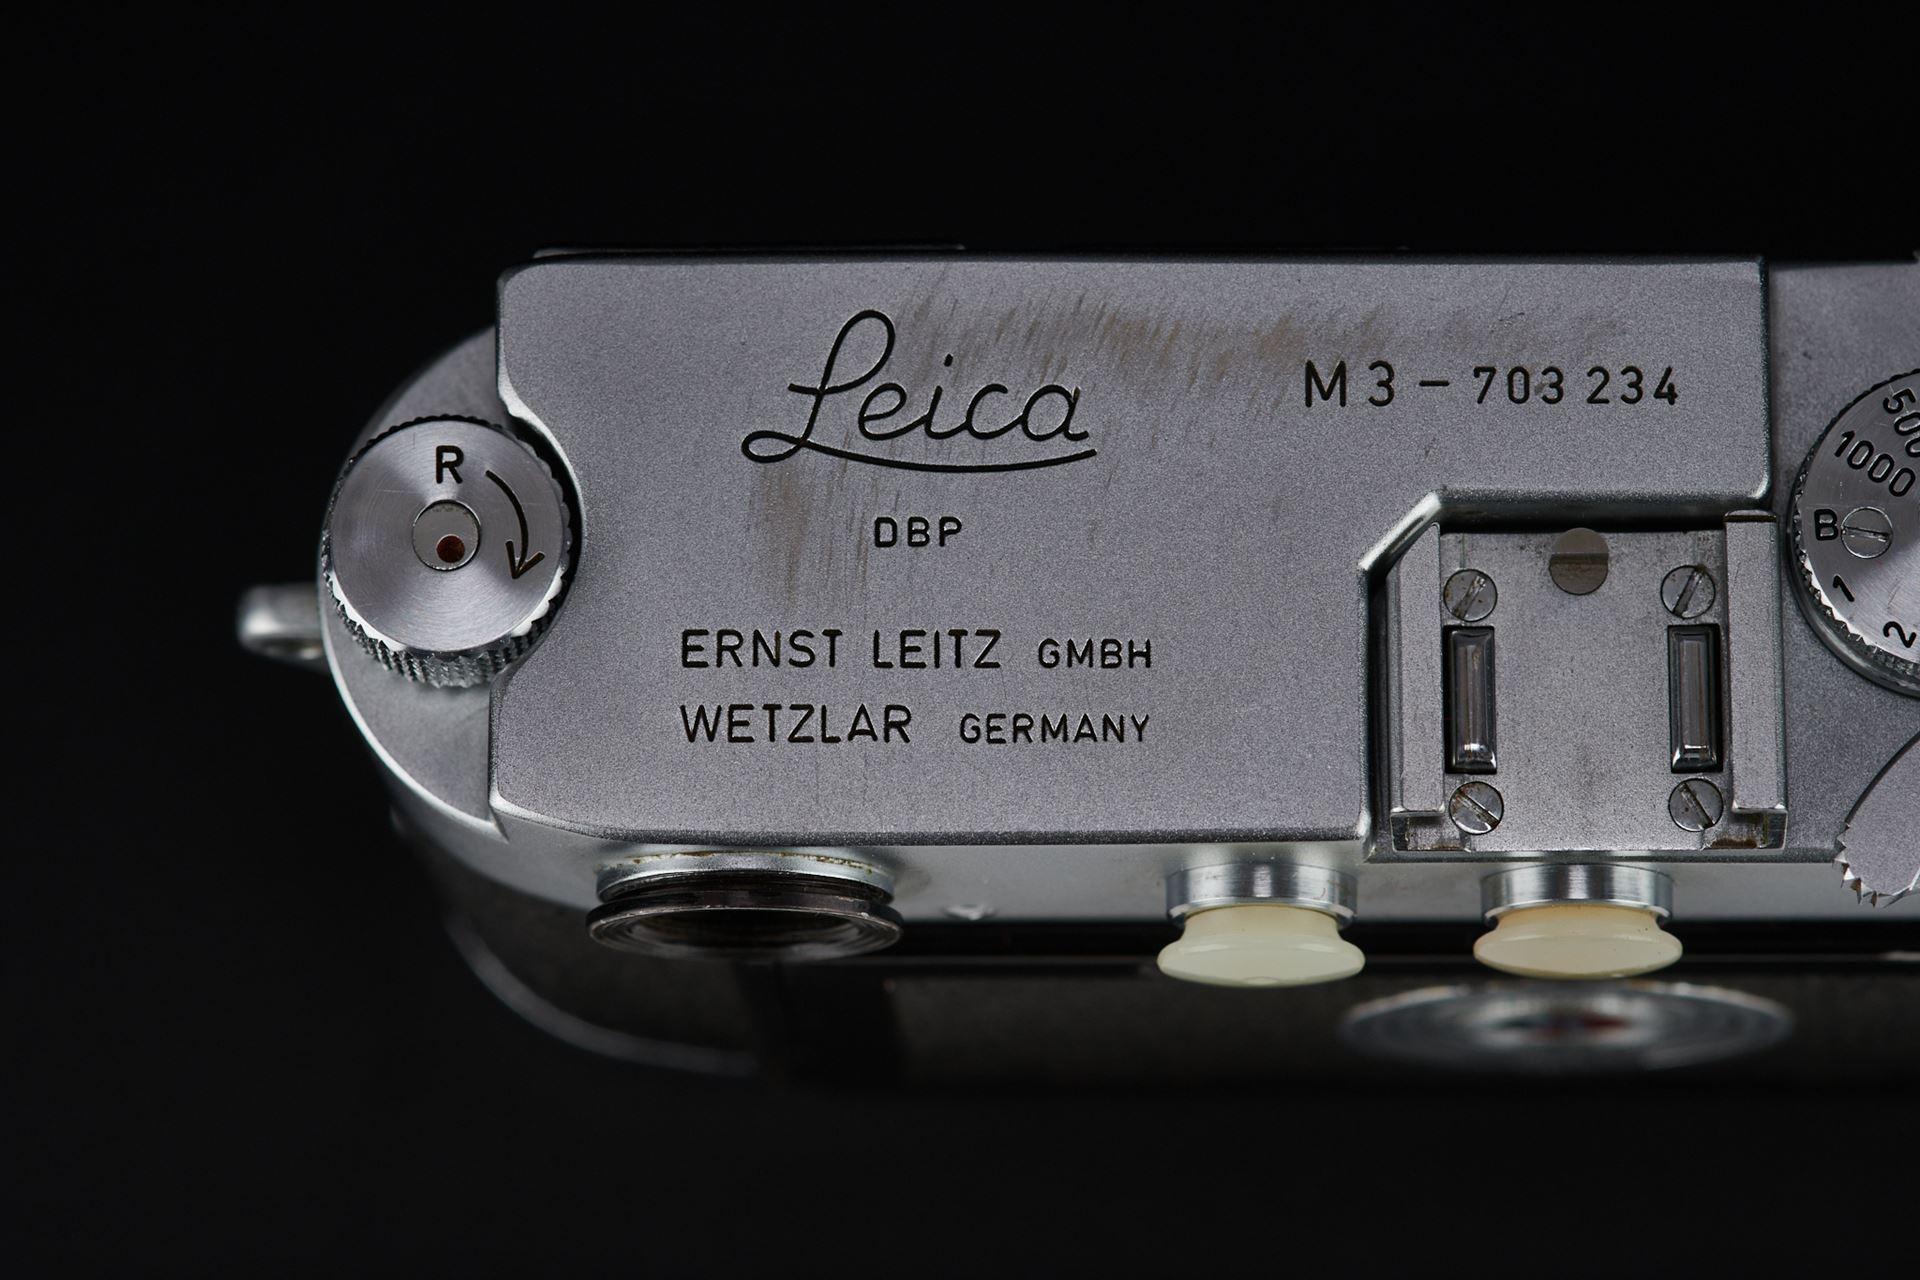 Picture of leica m3 silver double stroke w/ elmar 5cm f/3.5